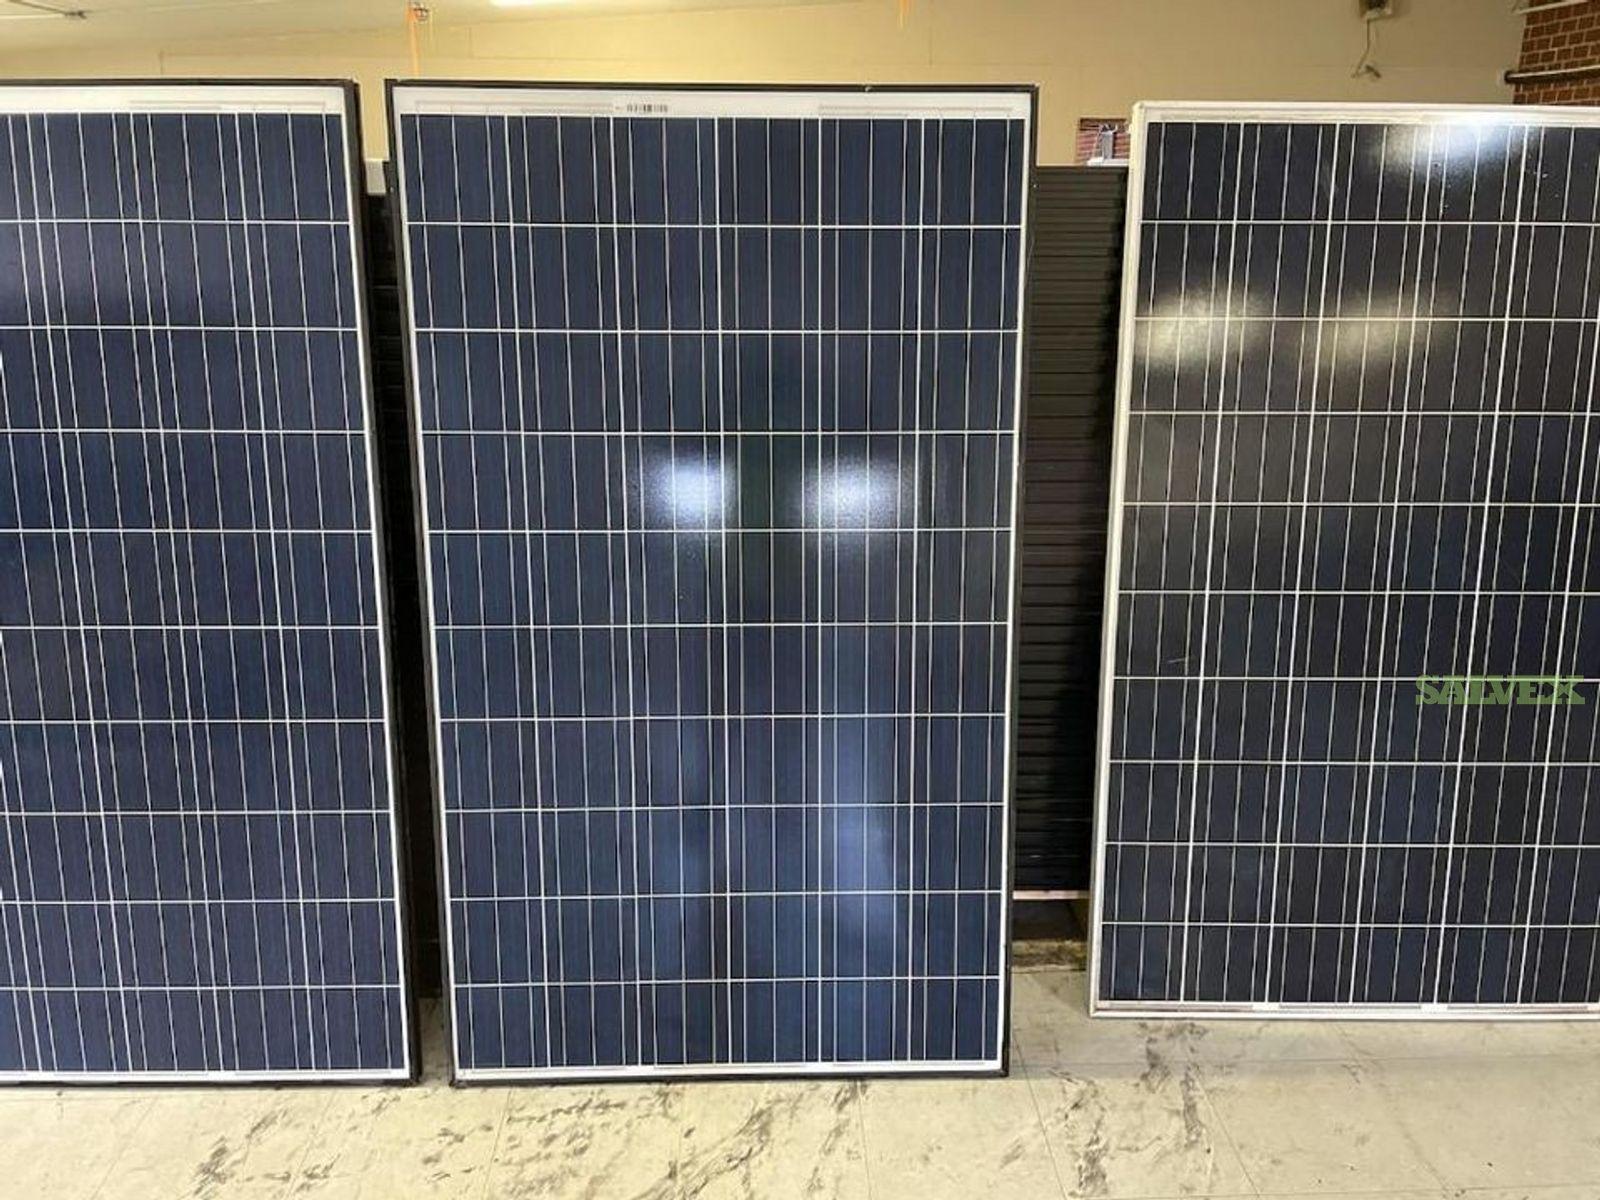 Canadian Solar 250W Solar Panels - Used (420 Panels)